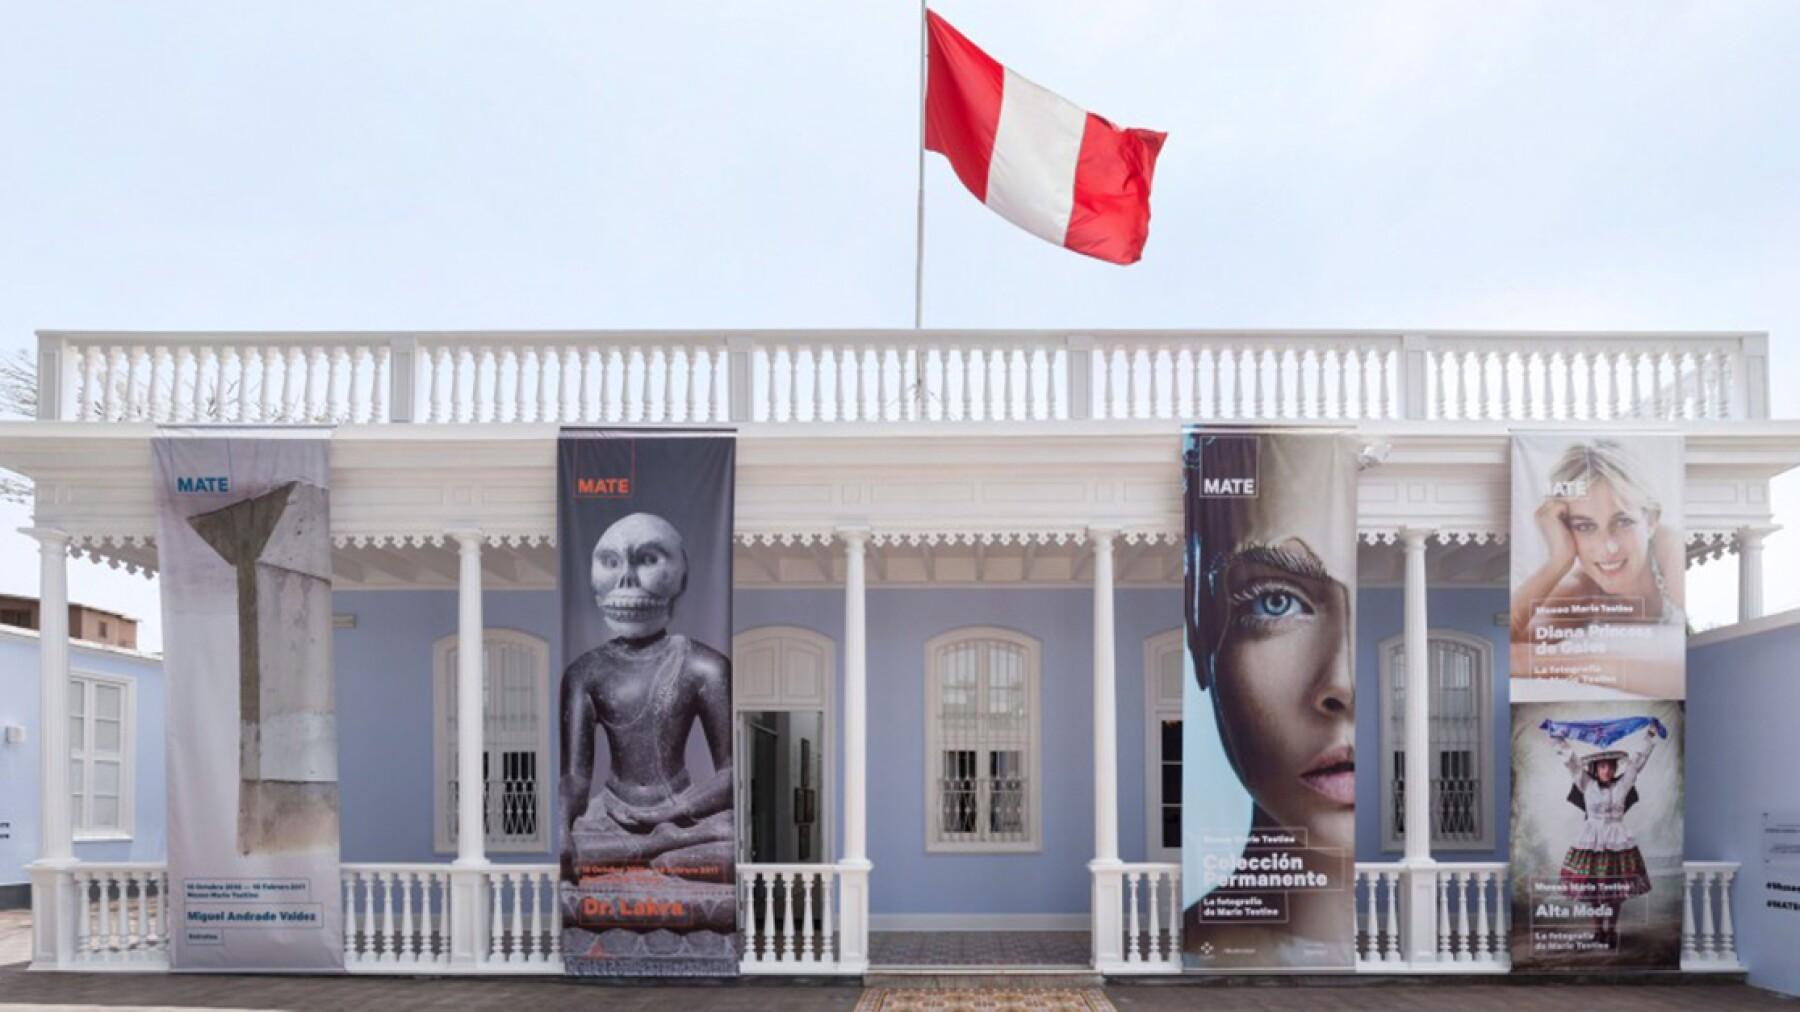 Mate Museo